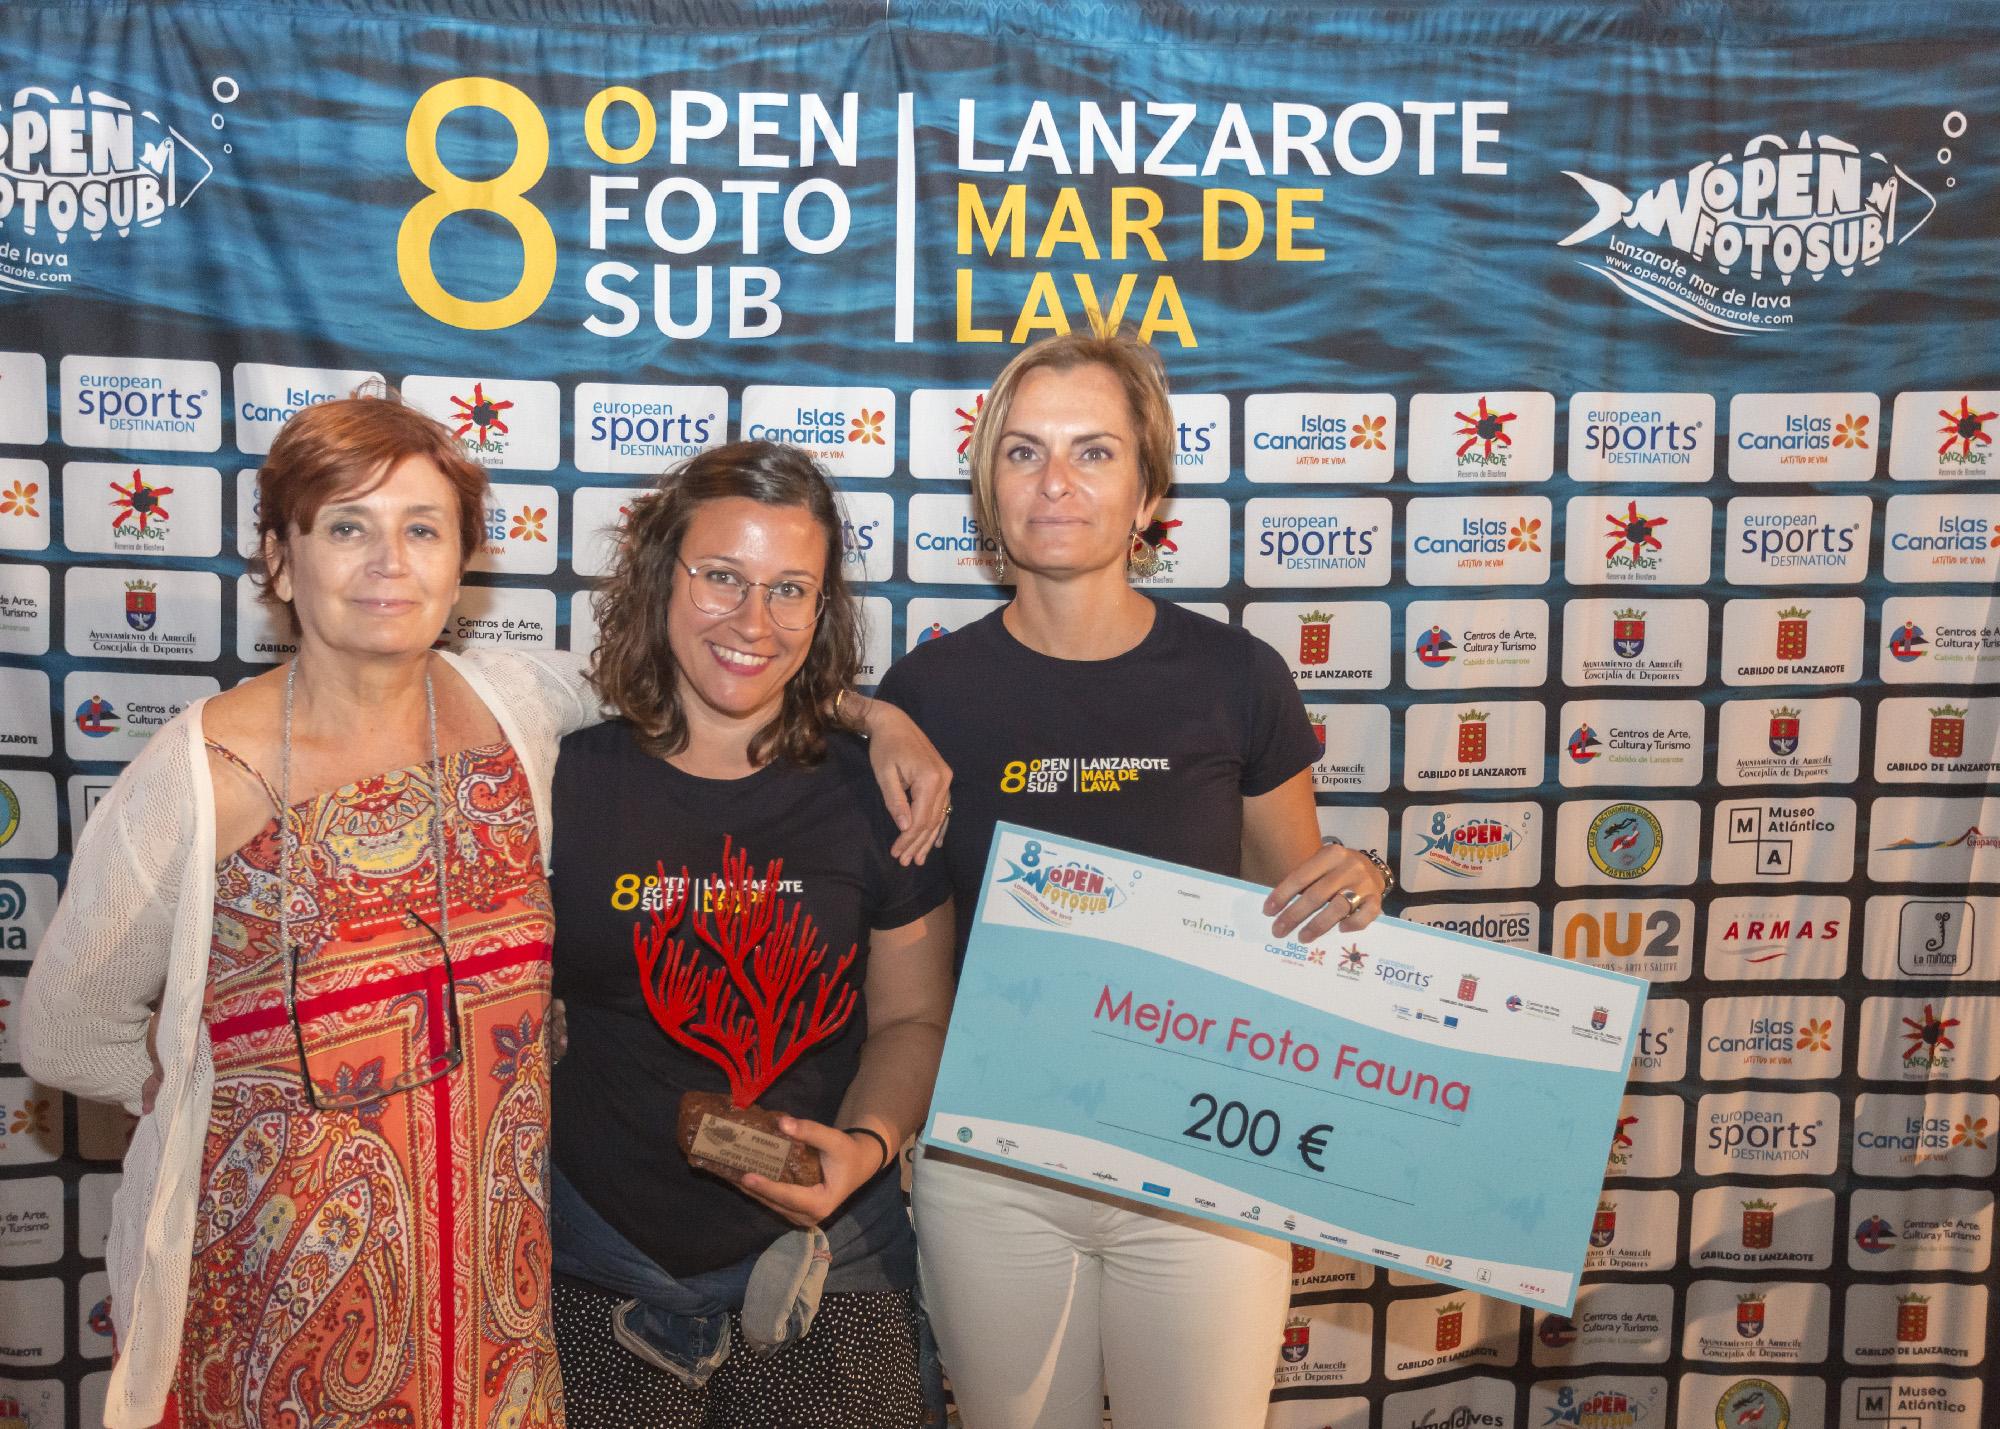 Open Fotosub Lanzarote Mar de Lava 50.jpg